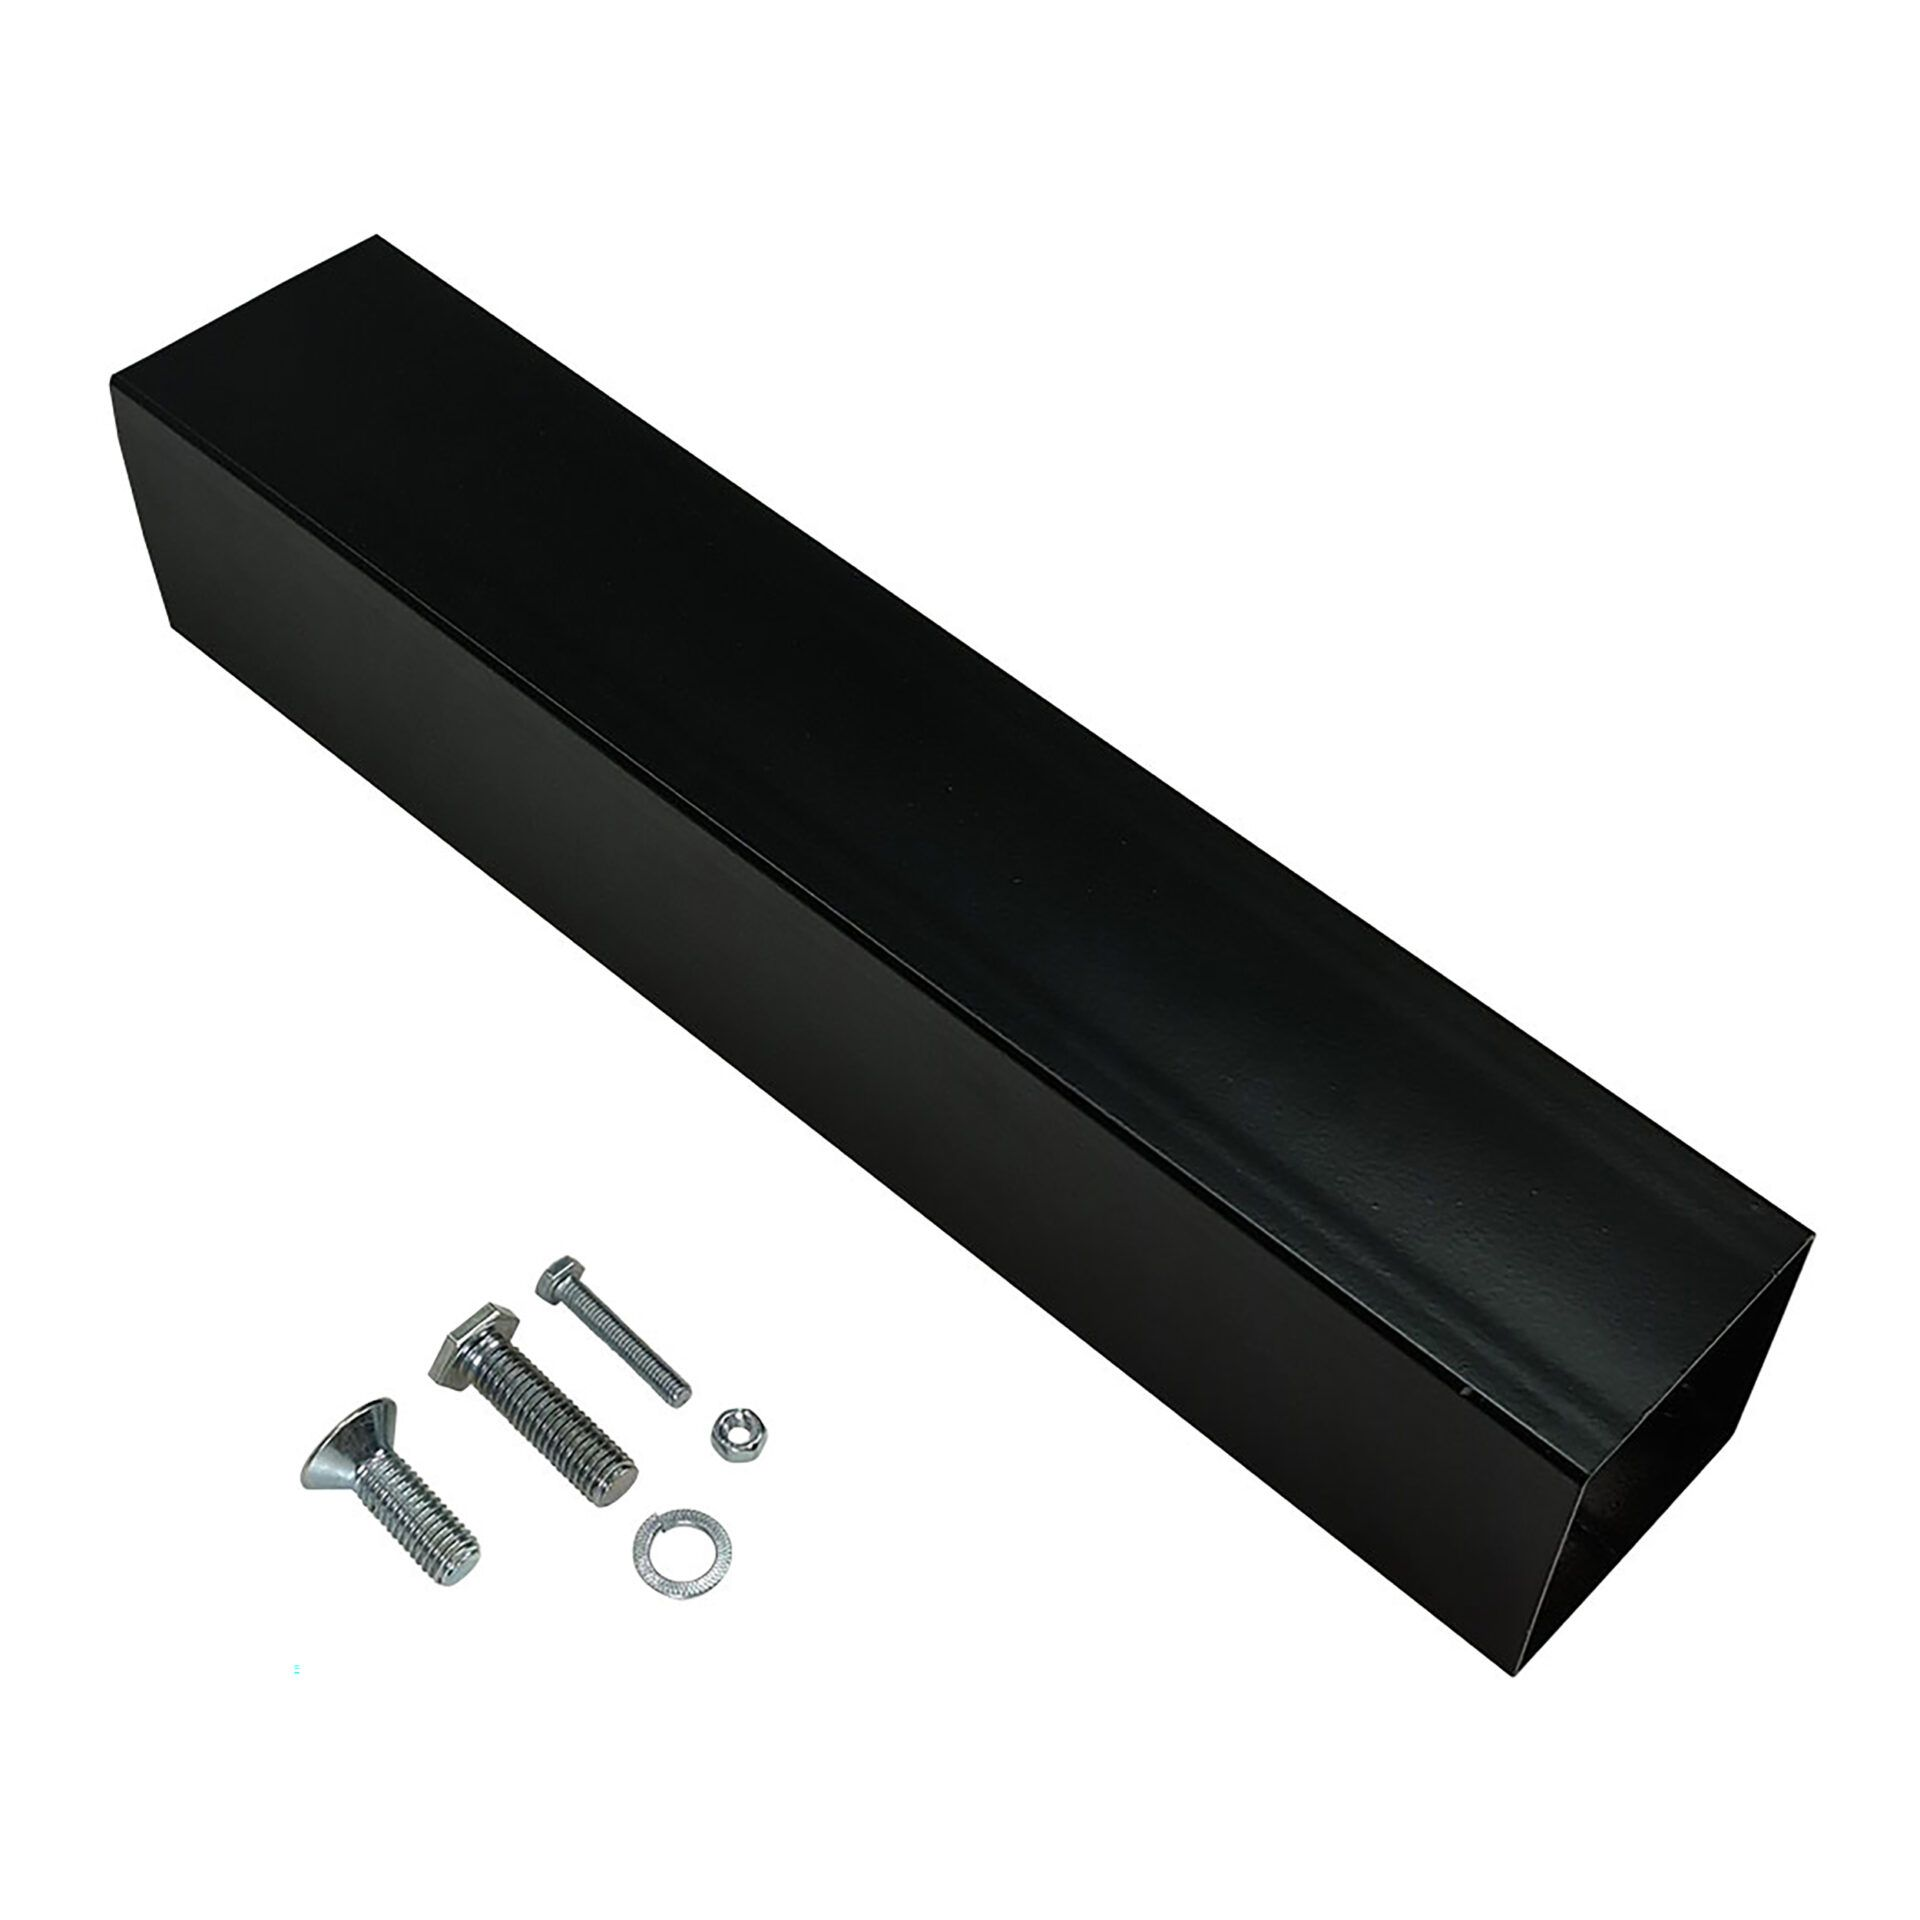 calais coffee table base black.pole .parts